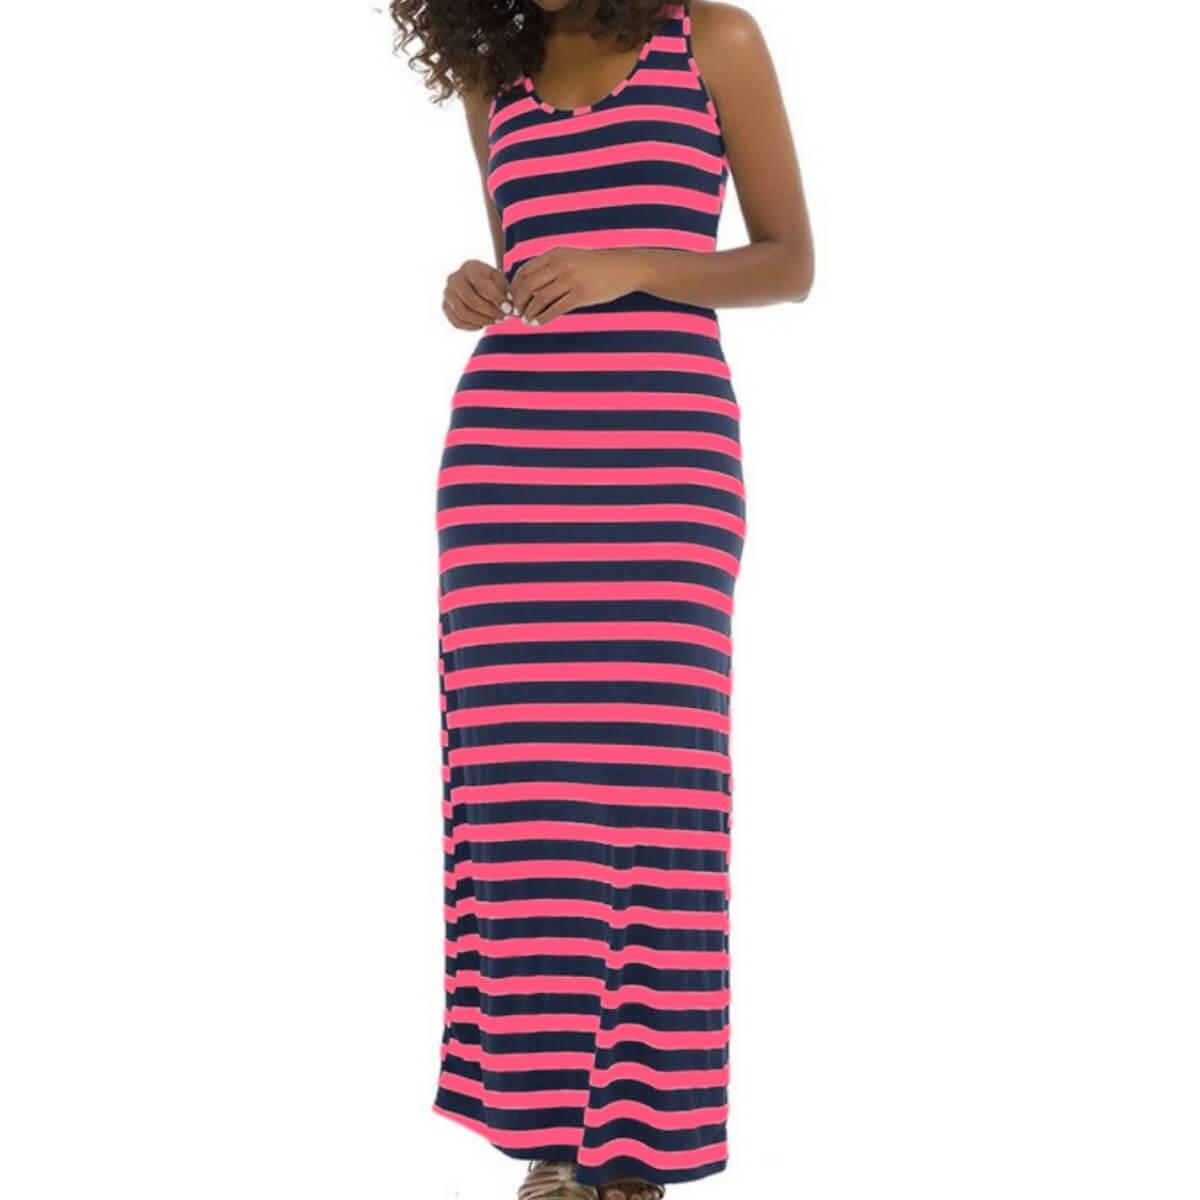 Vestido Feminino Longo Listrado Fúcsia